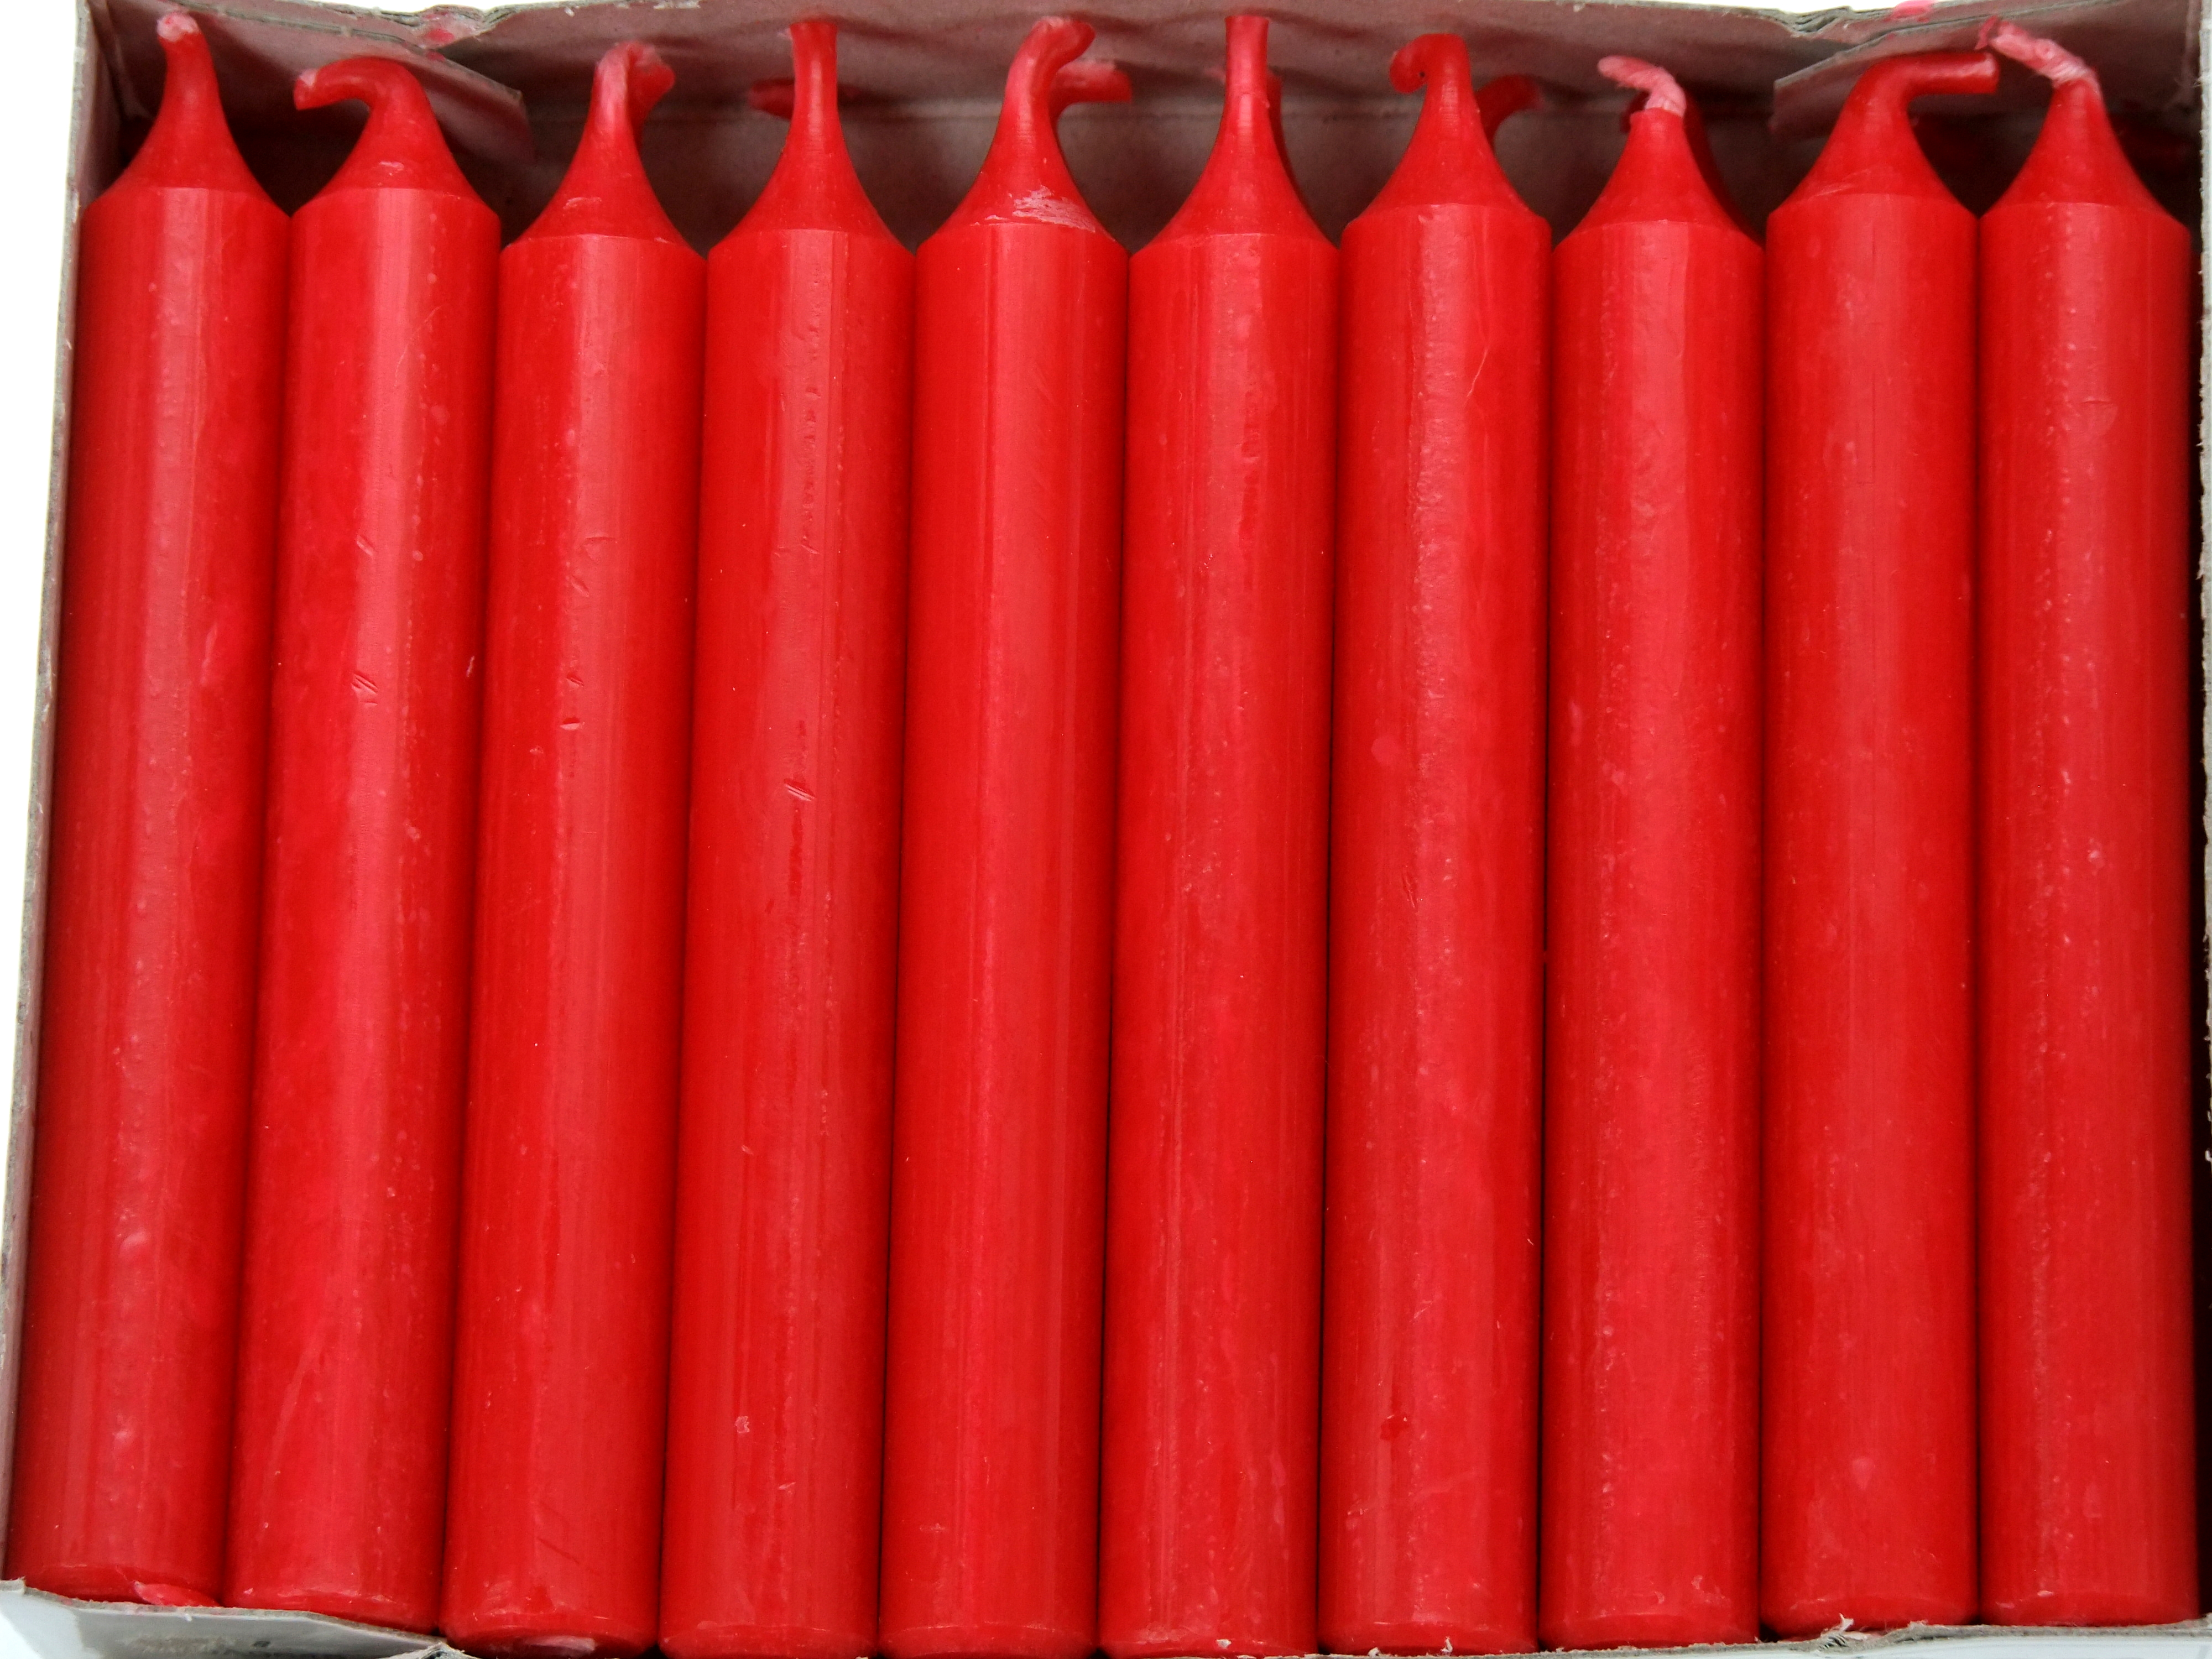 Kerze rot durchgefärbt